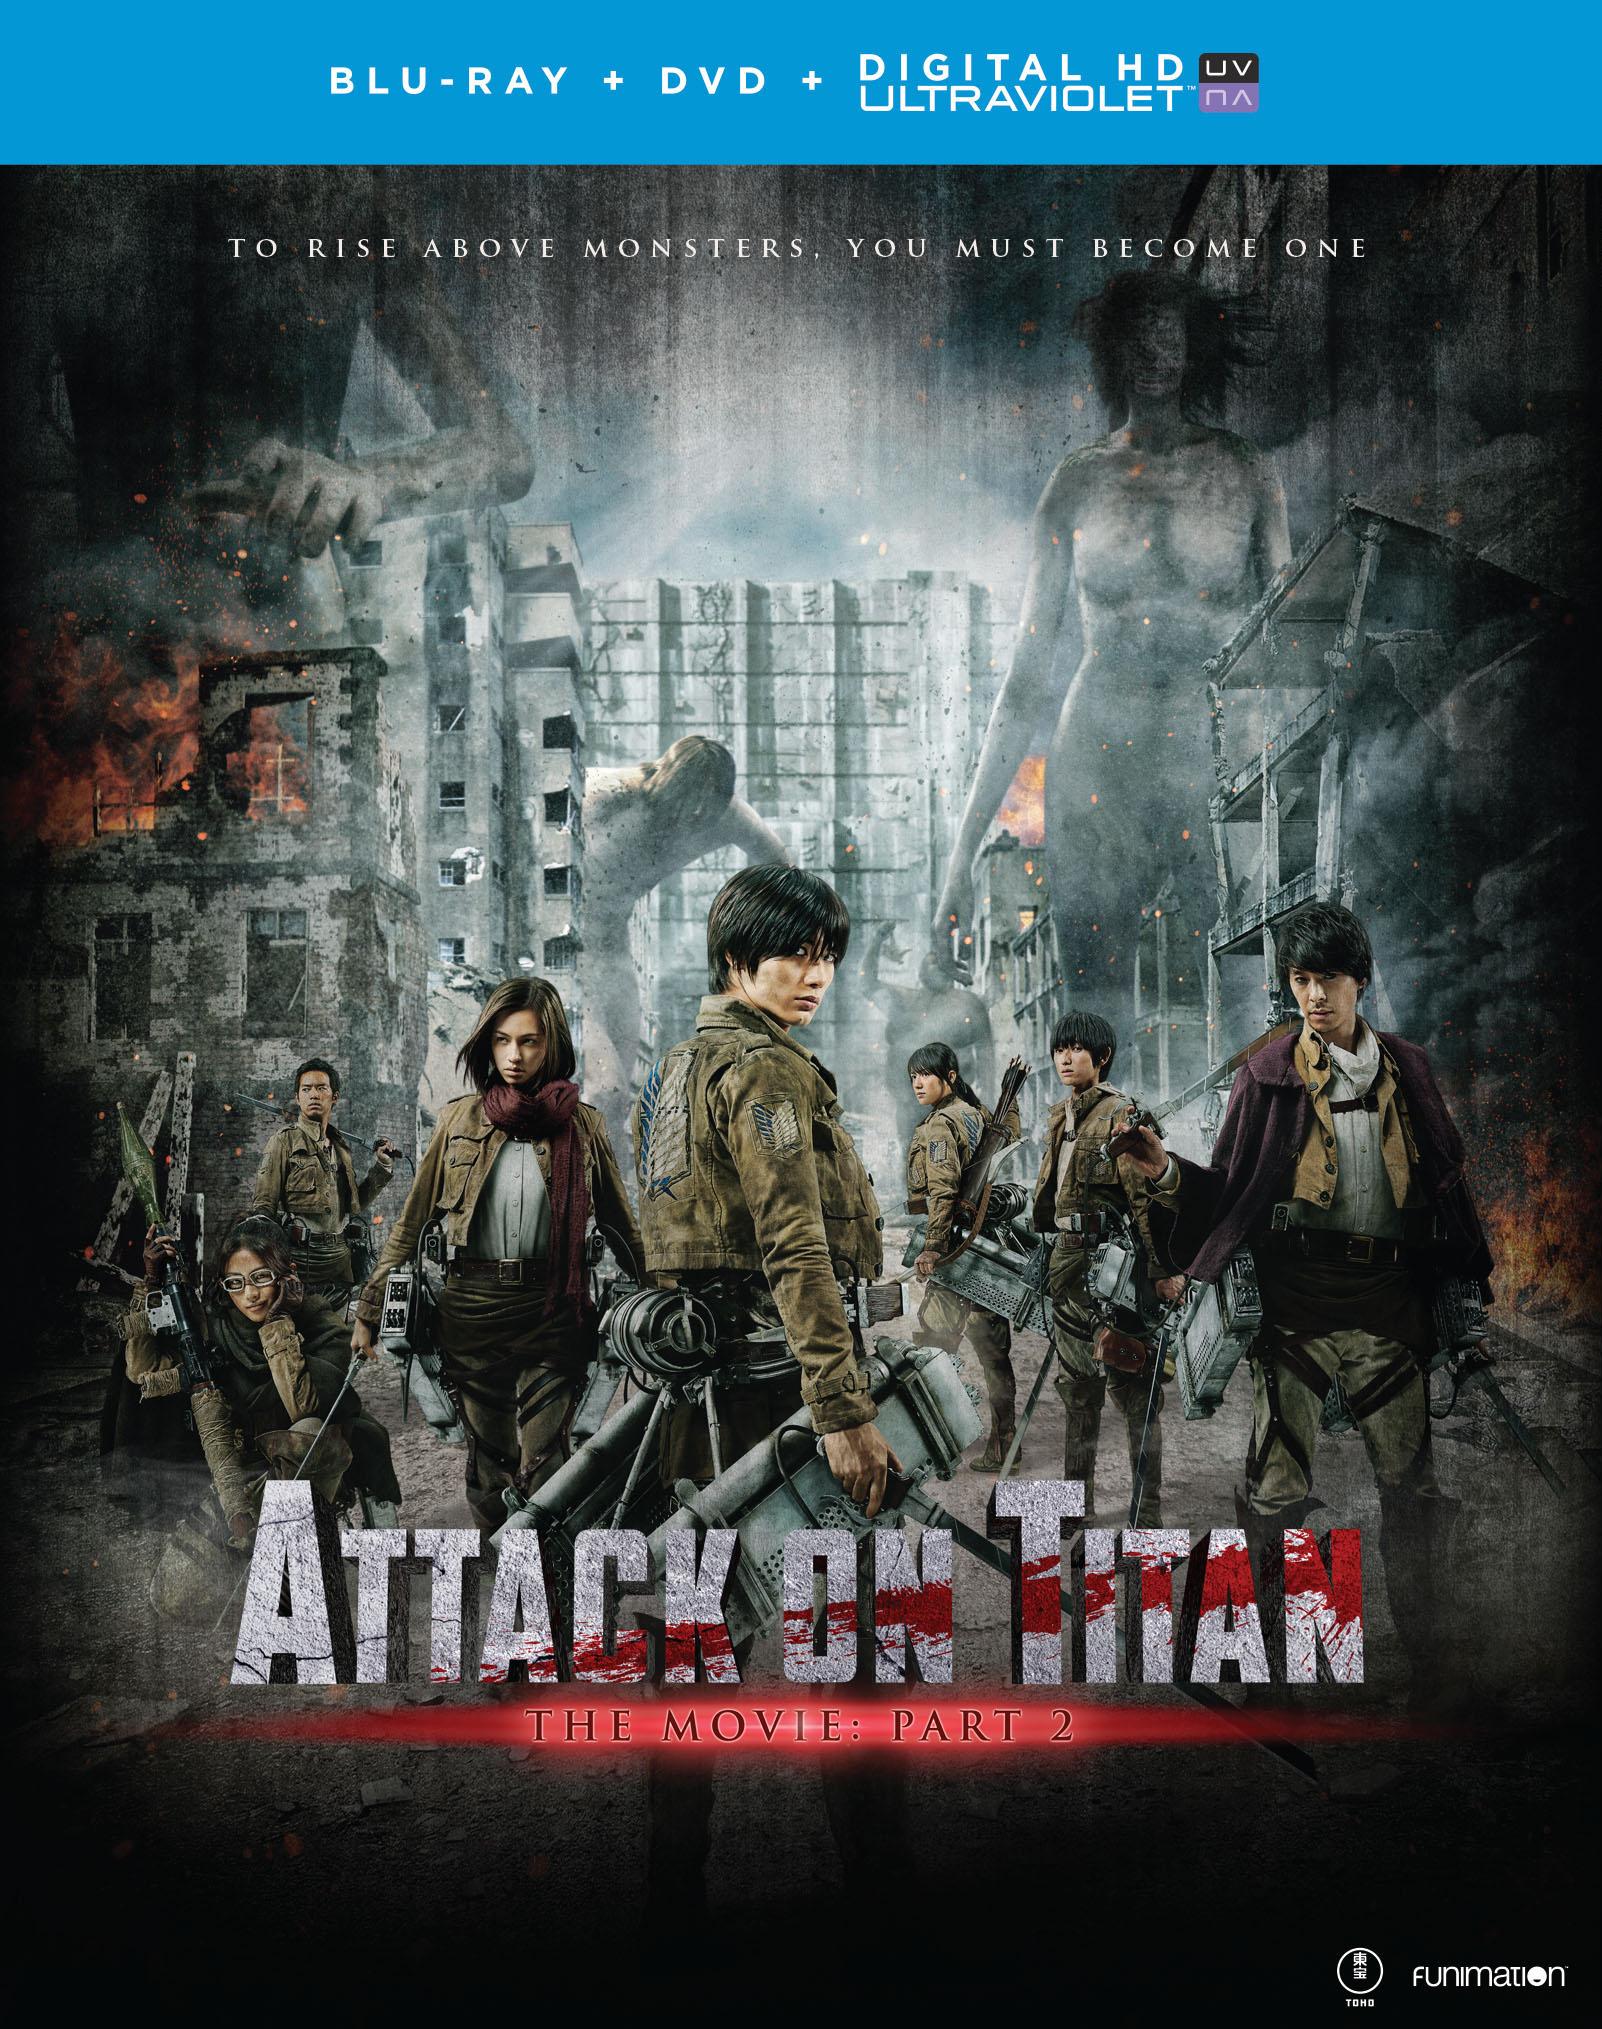 Attack on Titan The Movie Part 2 Blu-ray/DVD + UV 704400072765